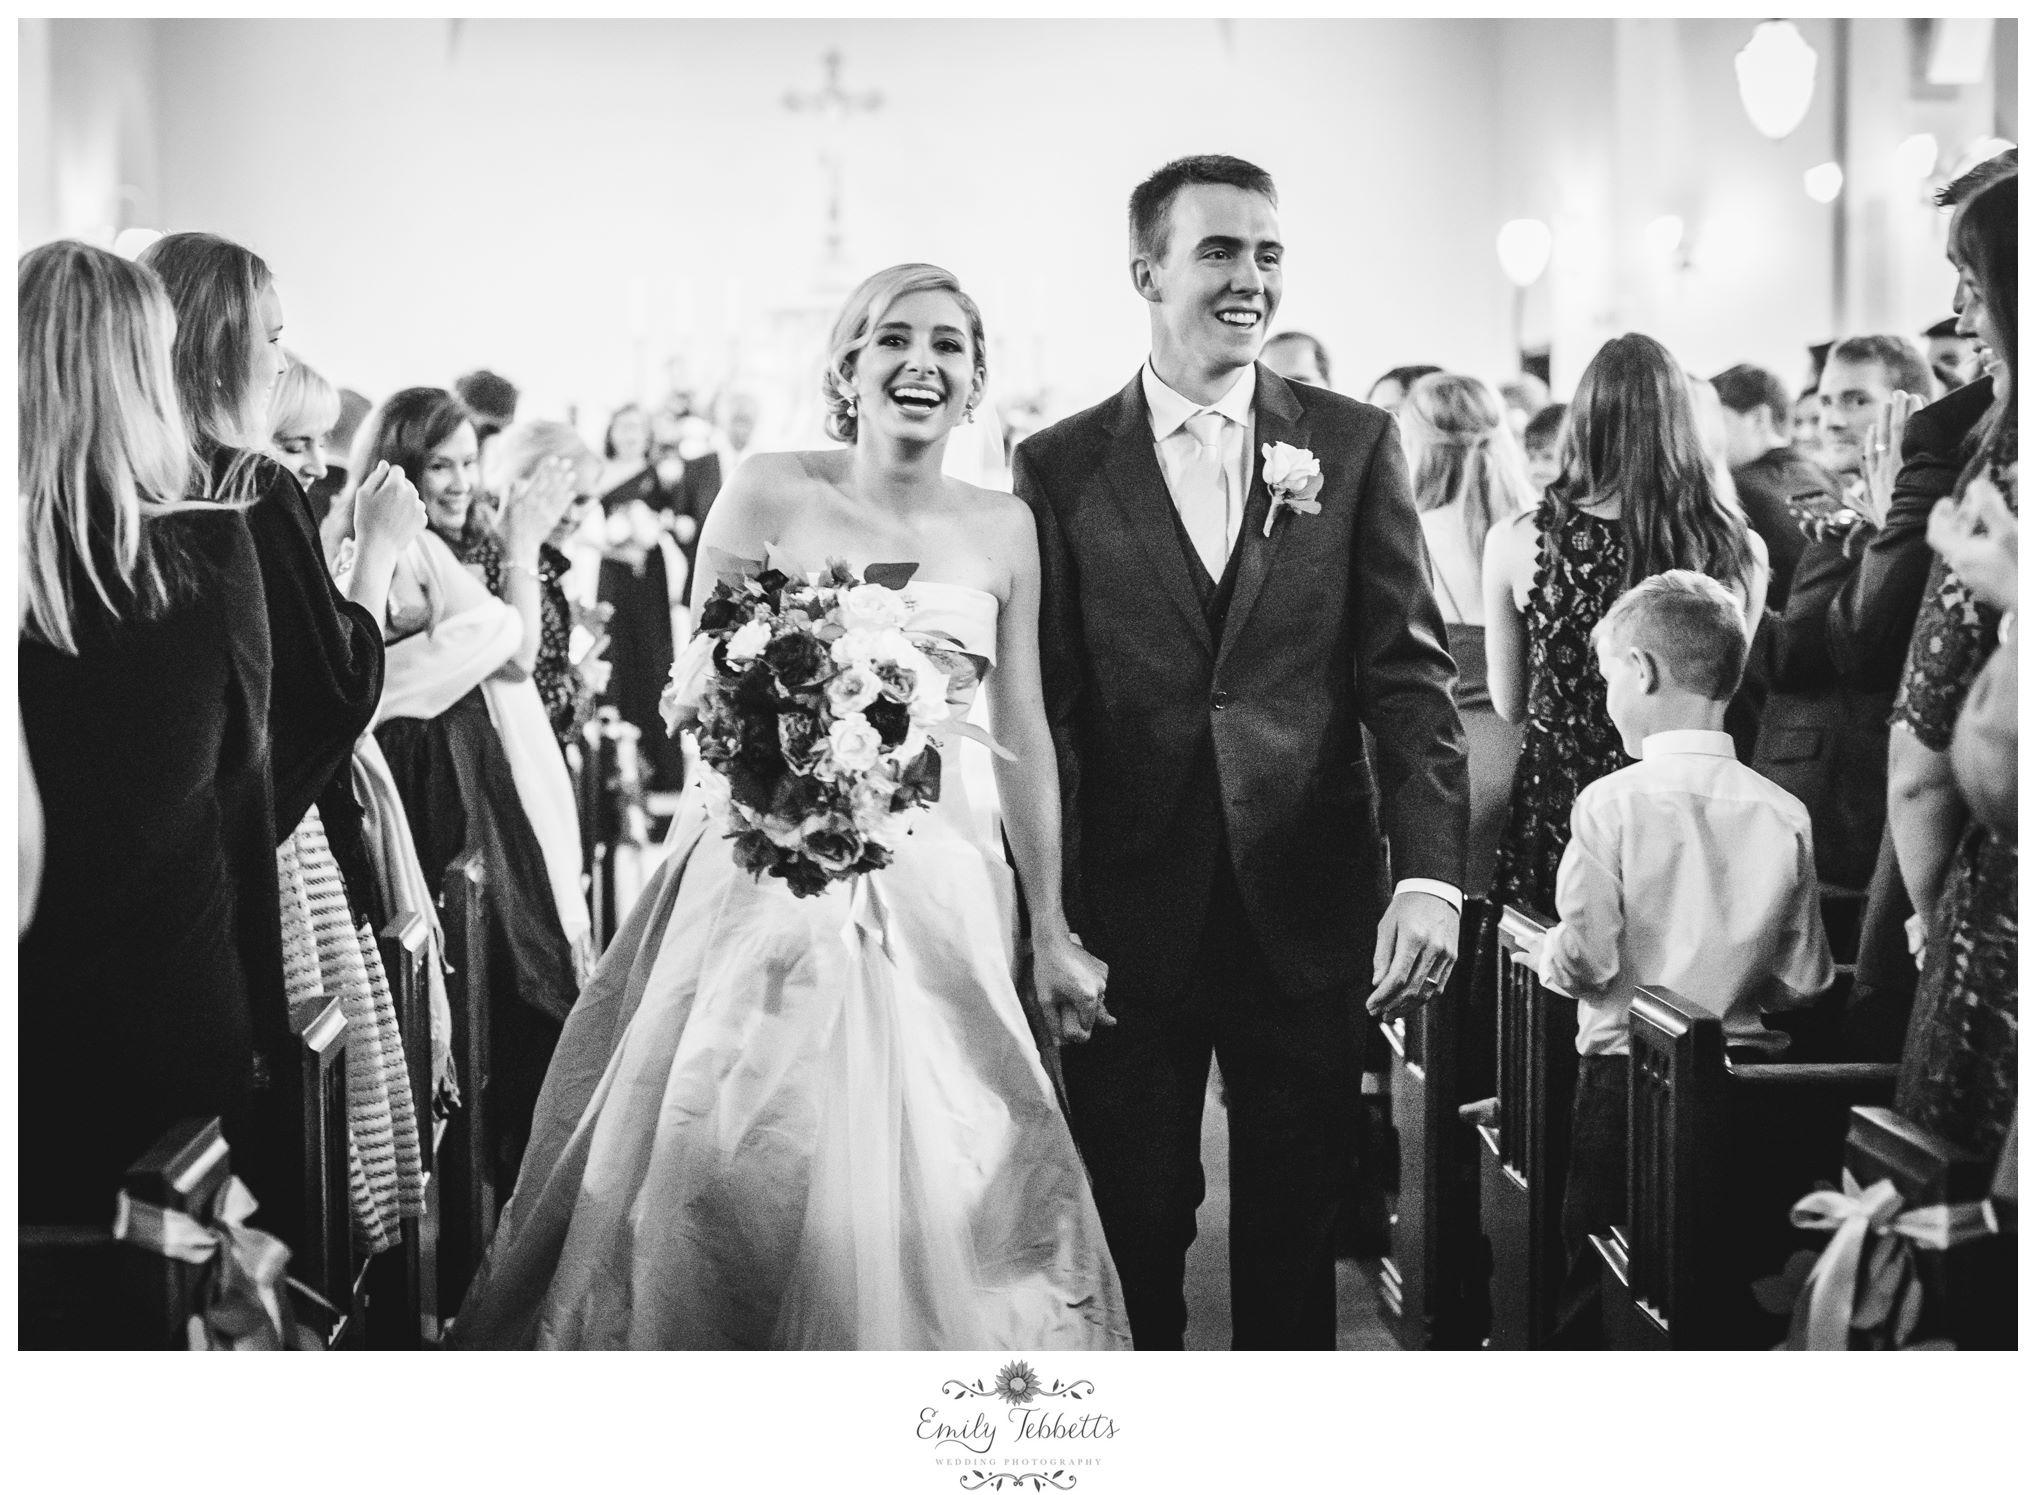 Crane Estate, Ipswich, MA - Emily Tebbetts Wedding Photography 3.jpg